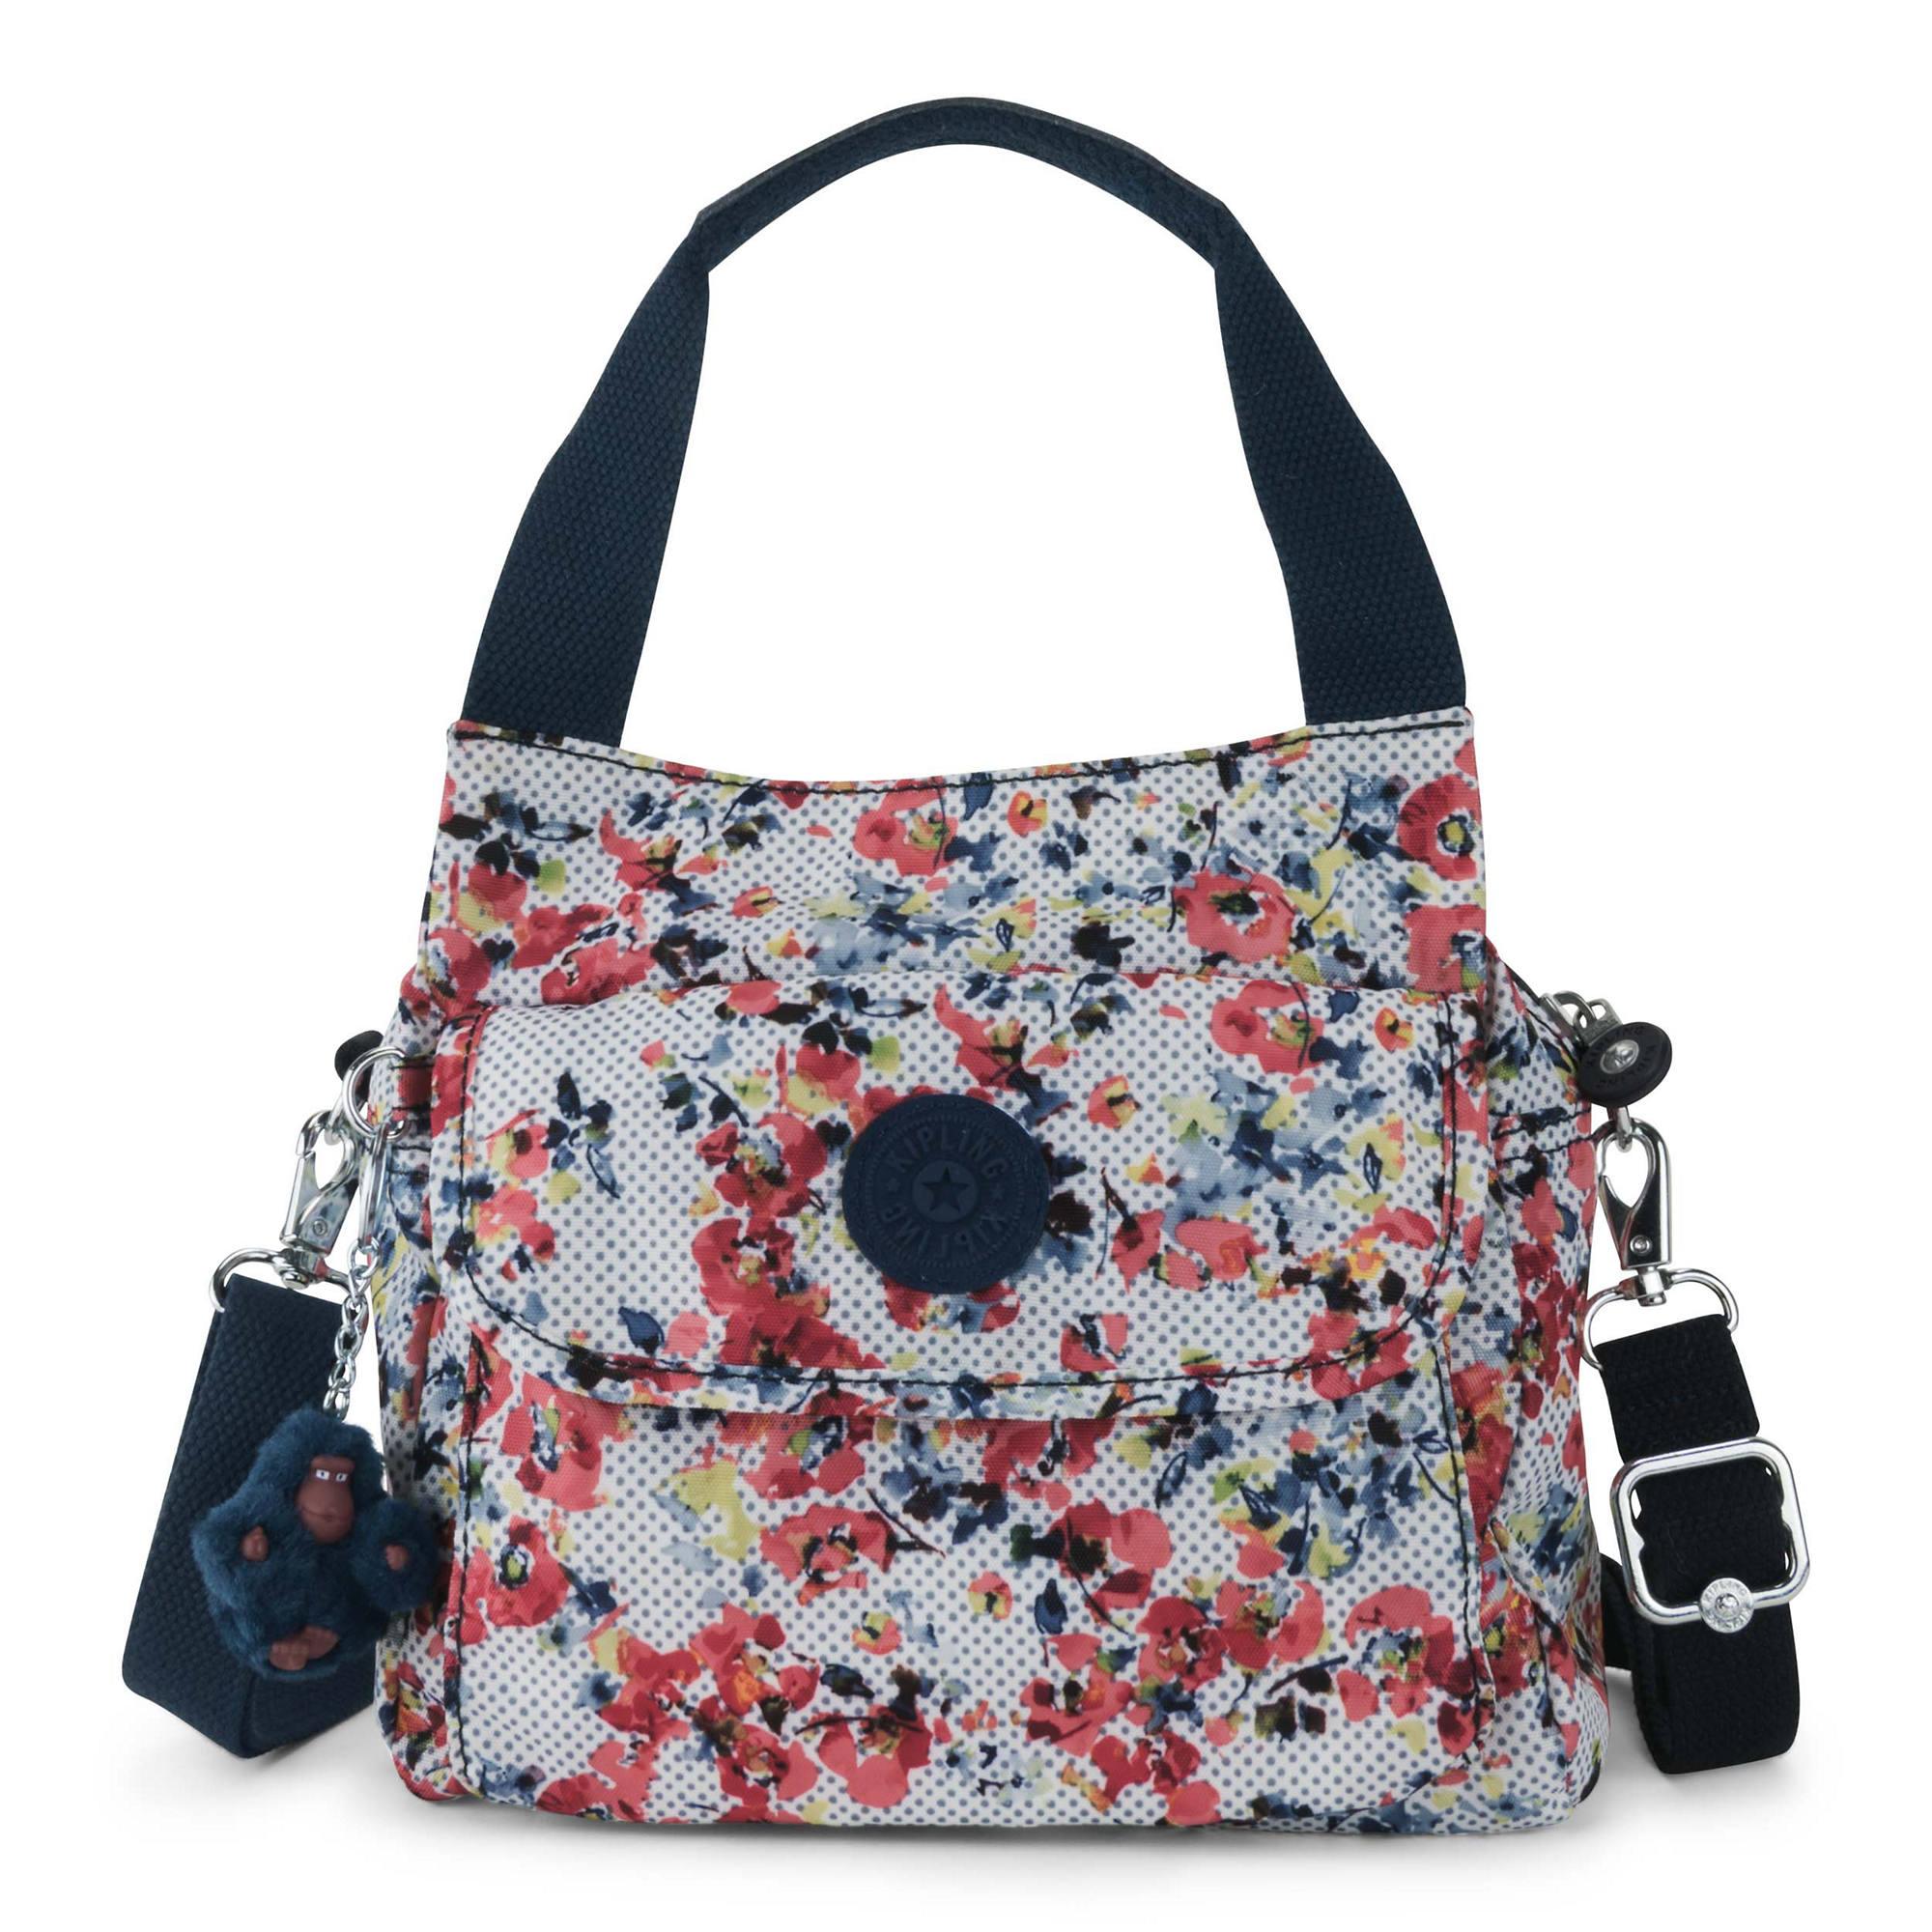 Felix Small Printed Handbag Busy Blossoms Large